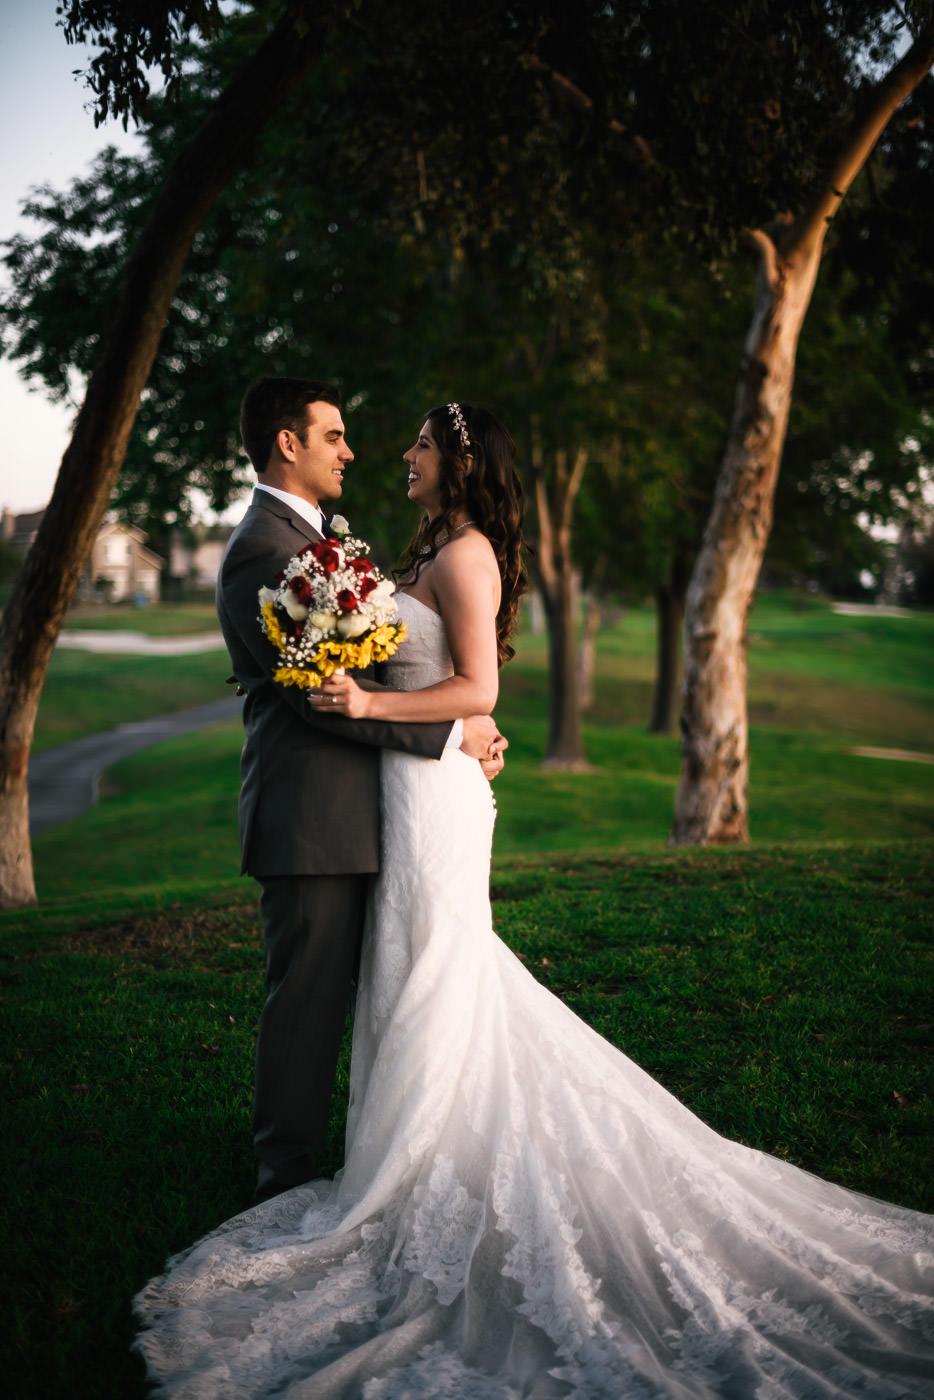 Weddings at Alta Vista Country Club.